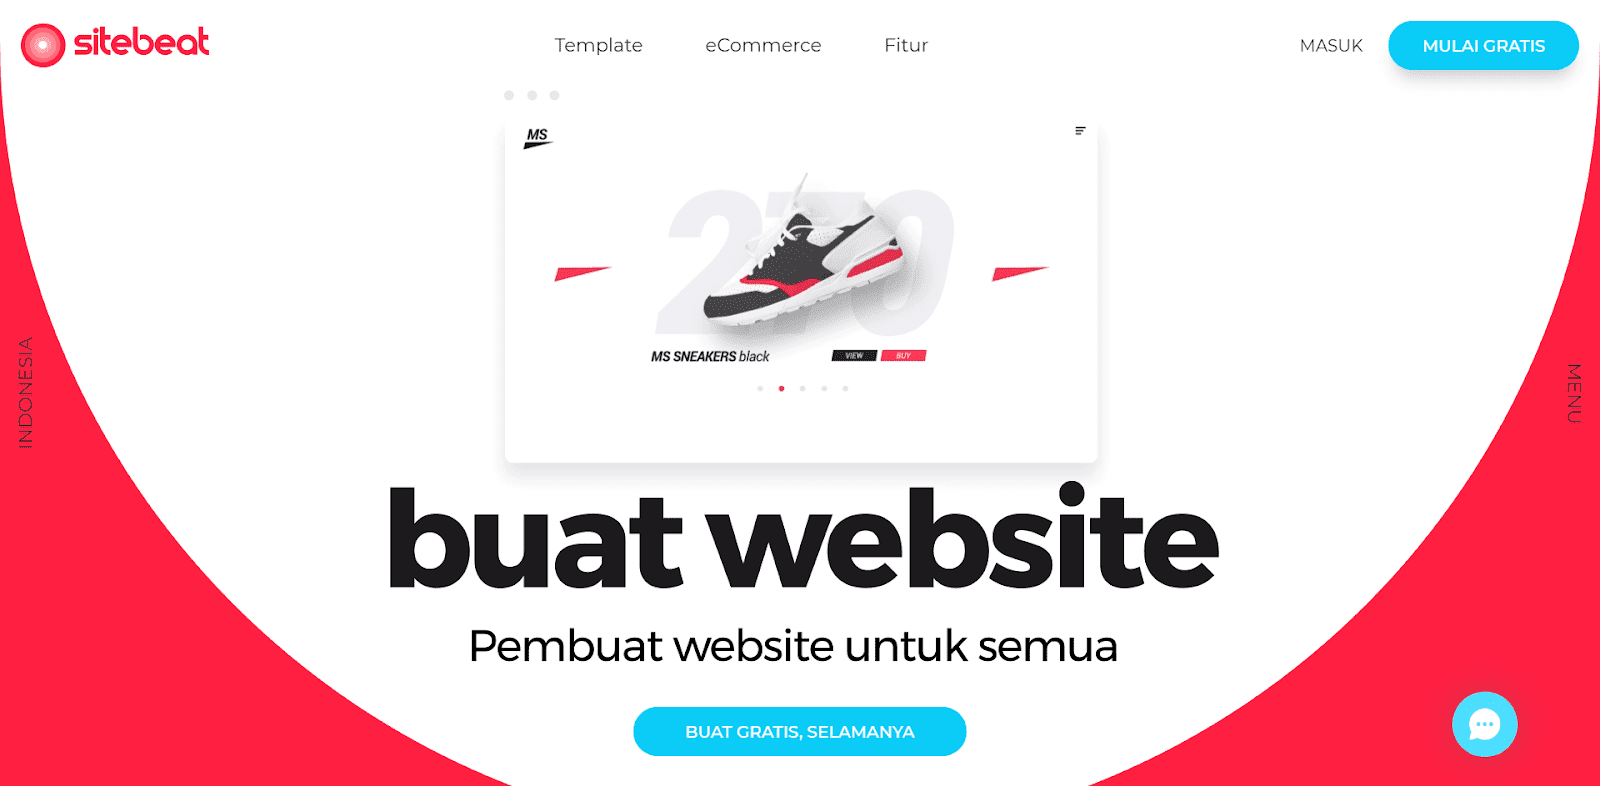 Cara Mudah Membuat Website Profesional di Sitebeat